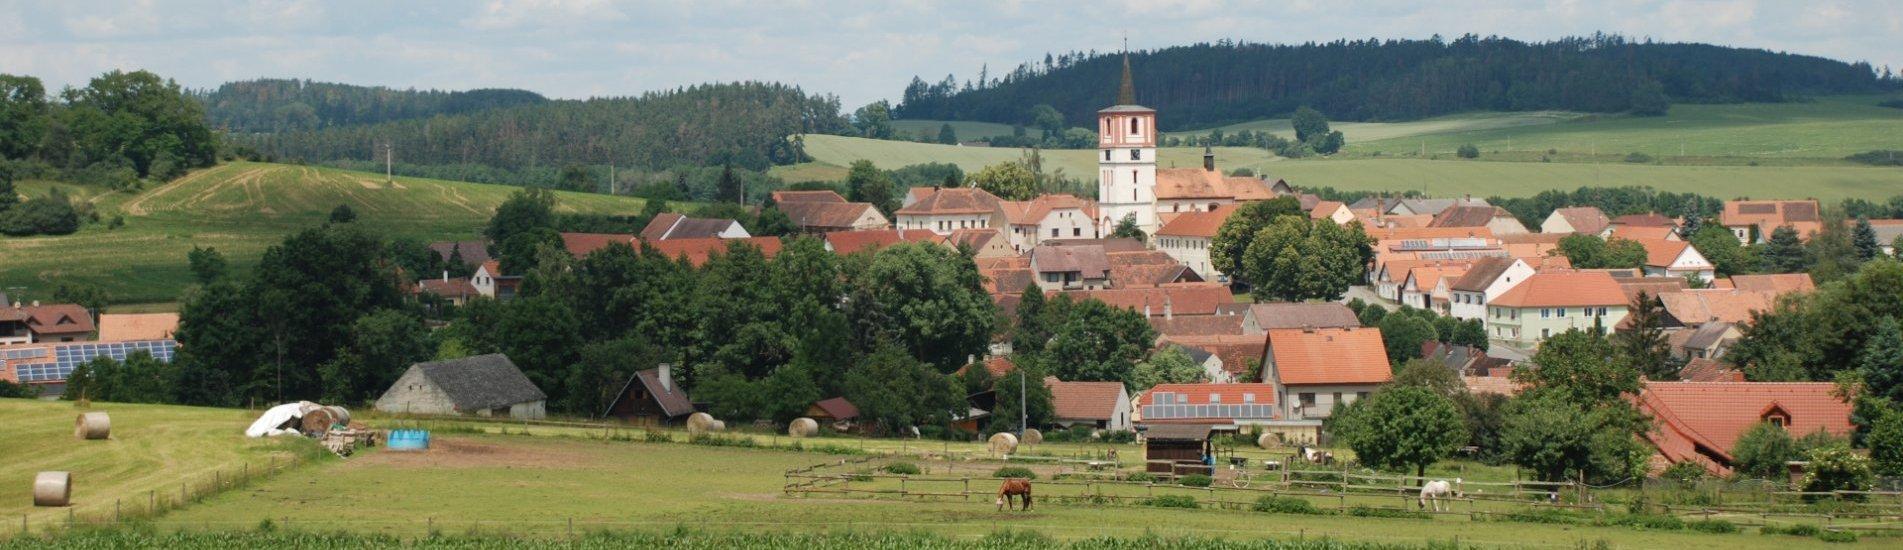 Pohled na obec Volenice